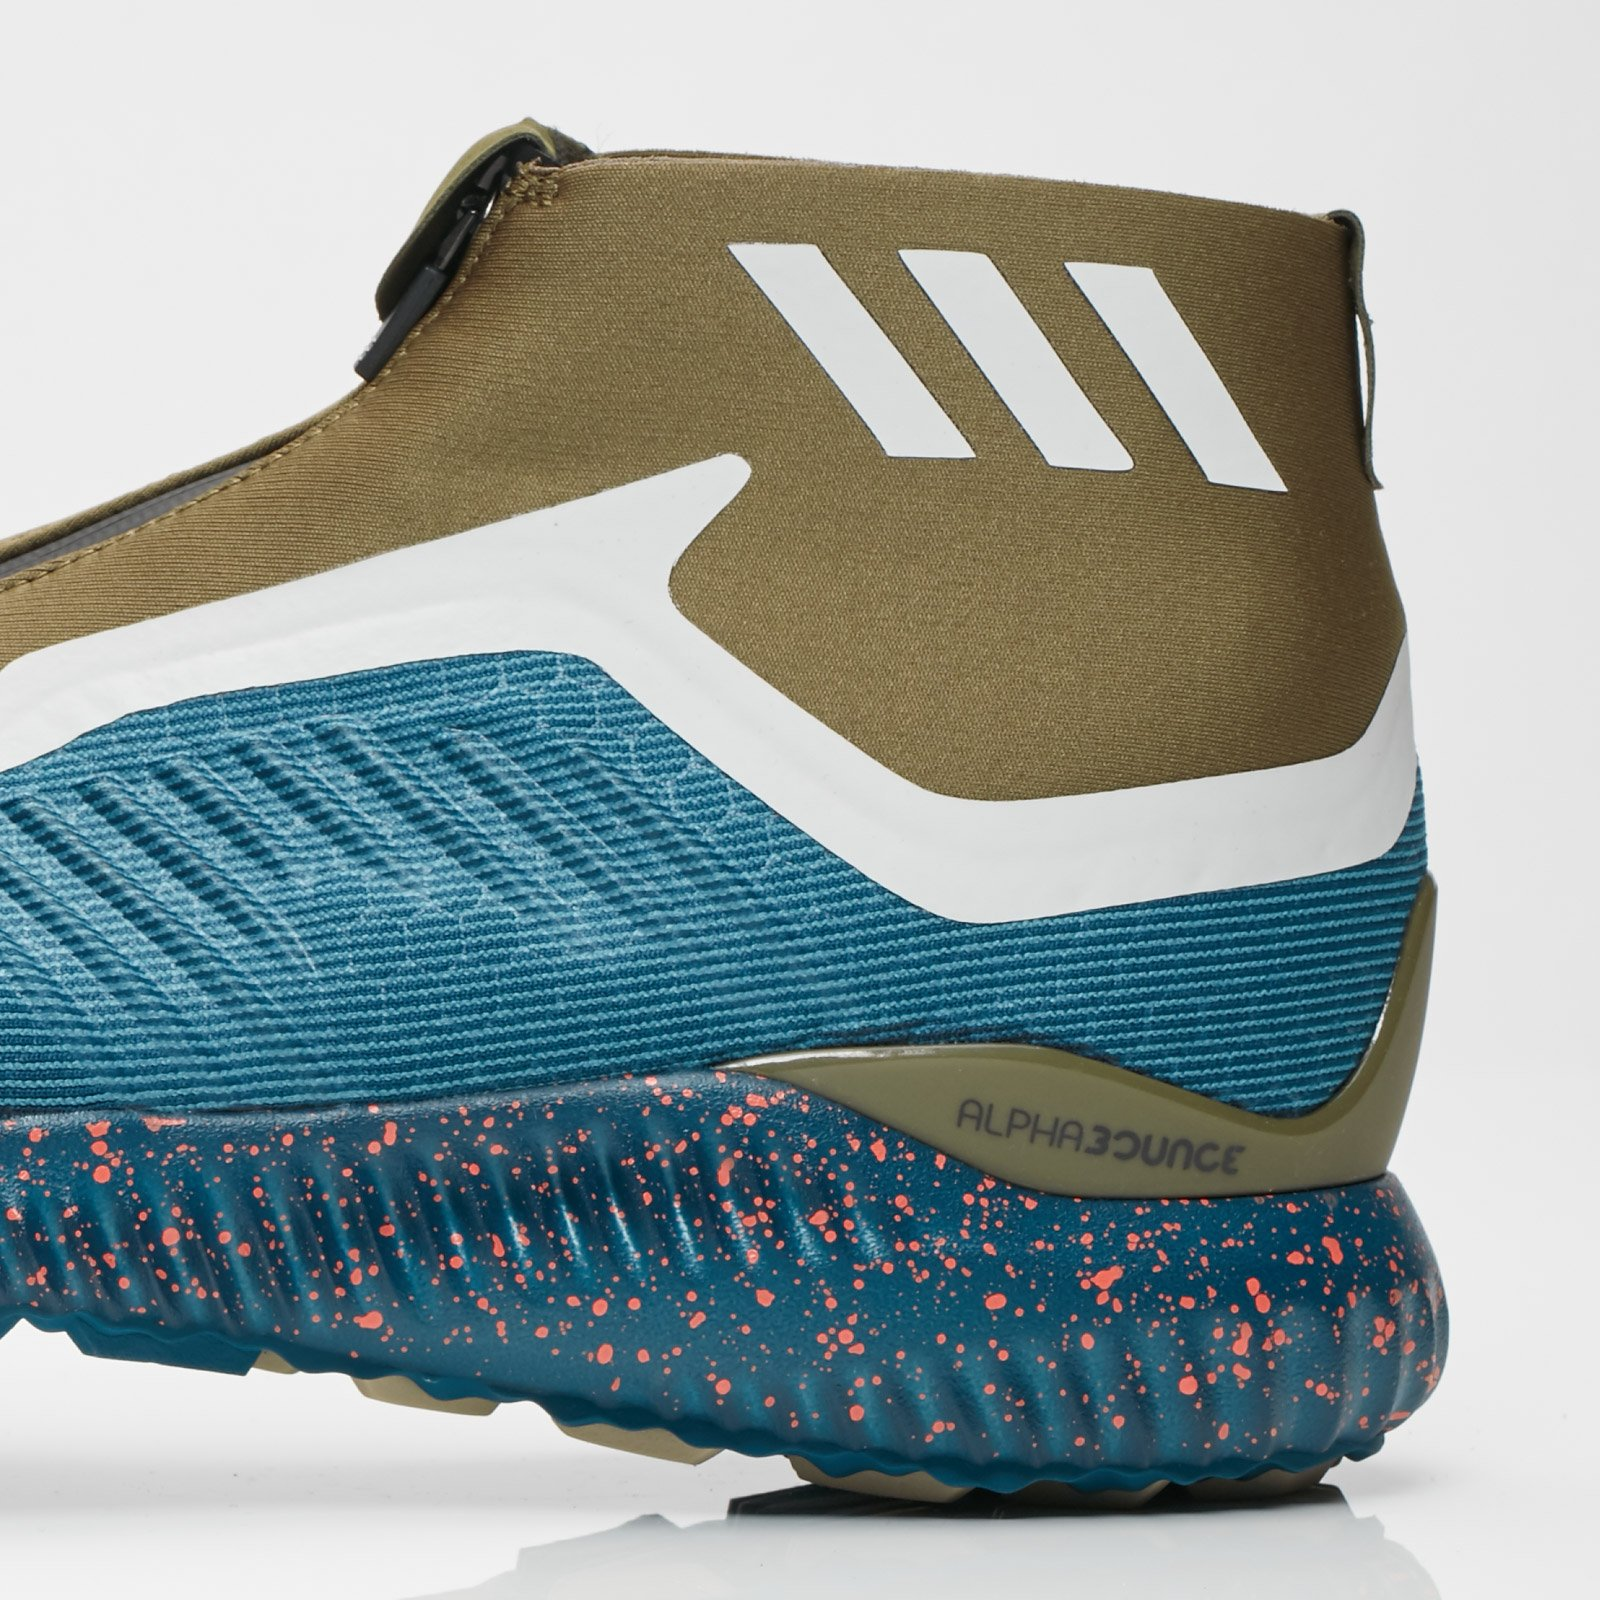 badaf08b27842 adidas Alphabounce Zip M - Bw1387 - Sneakersnstuff